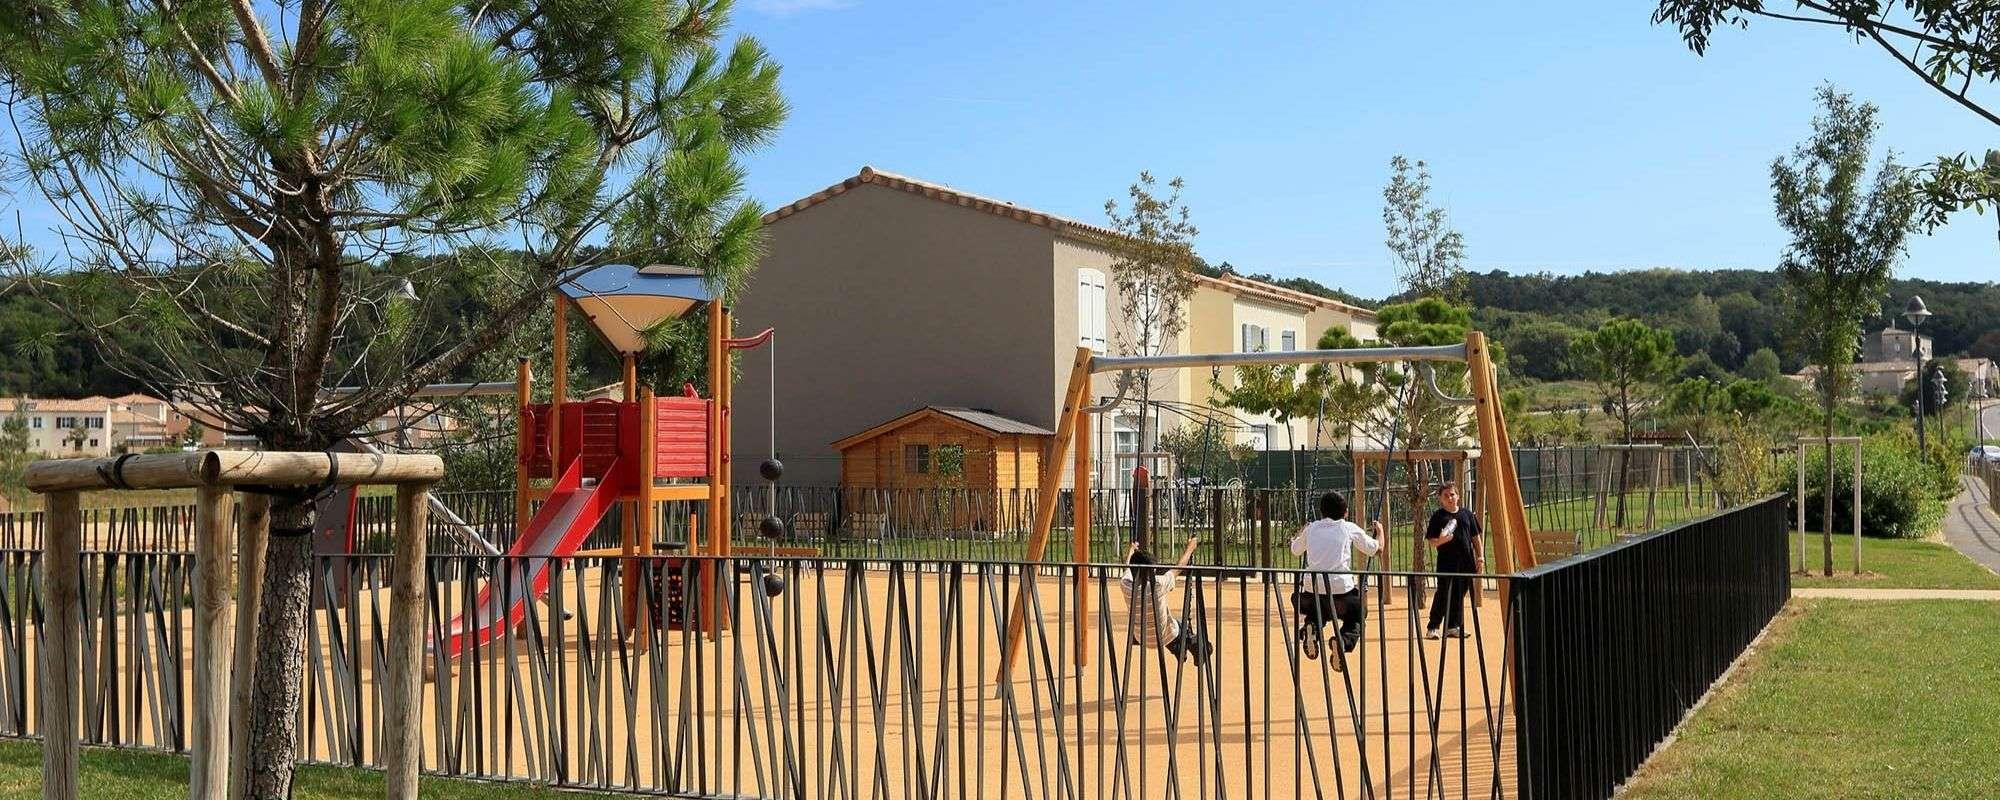 Terrain-à-bâtir-GGL-Montélimar-Maubec (4)